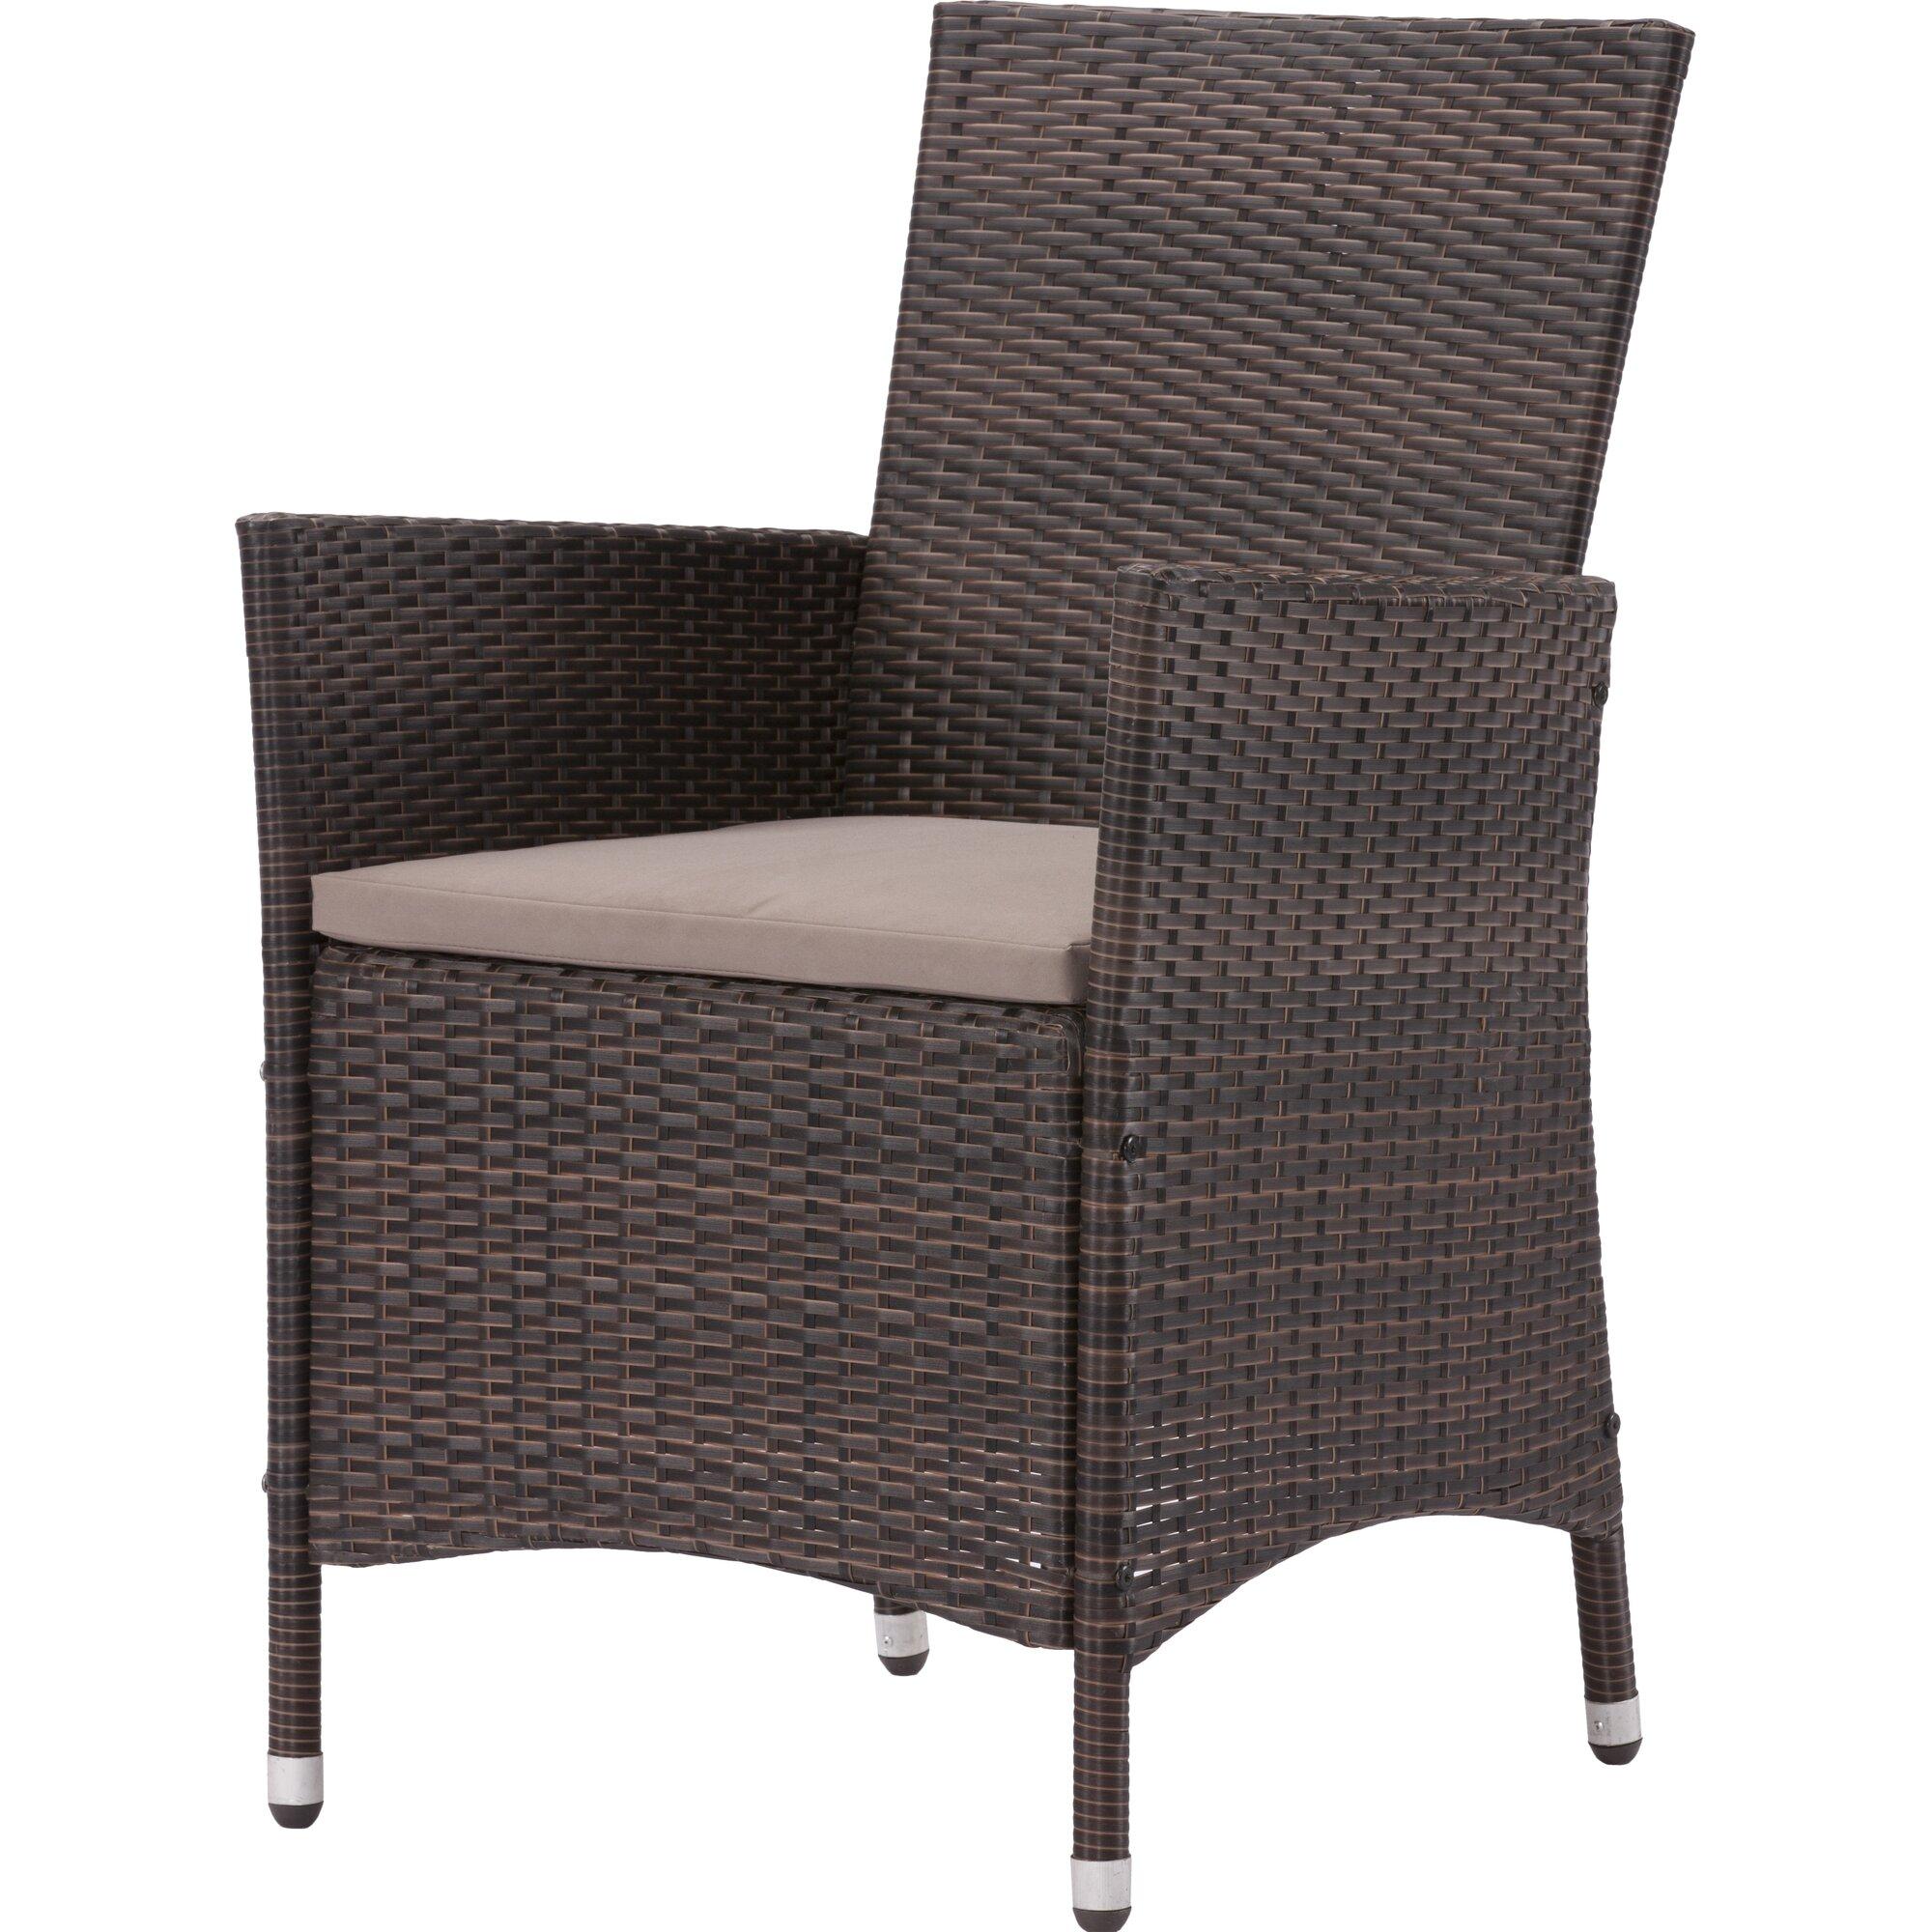 garten living 8 sitzer gartengarnitur akebia mit polster. Black Bedroom Furniture Sets. Home Design Ideas